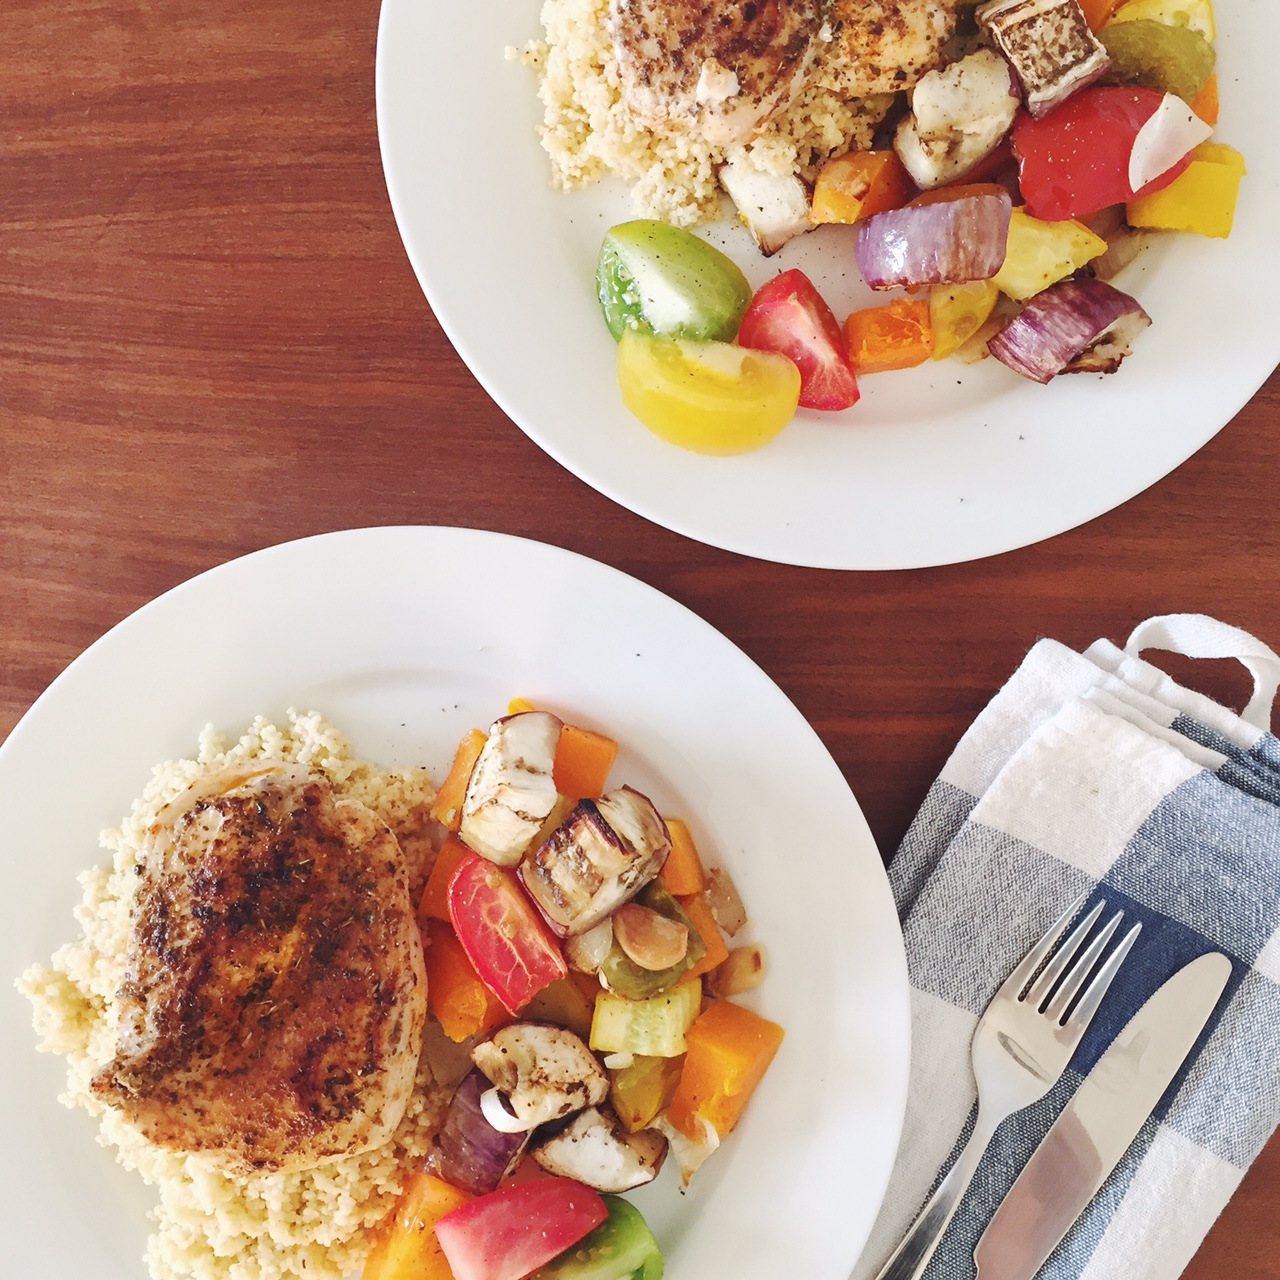 Mediterranean chicken recipe with couscous salad